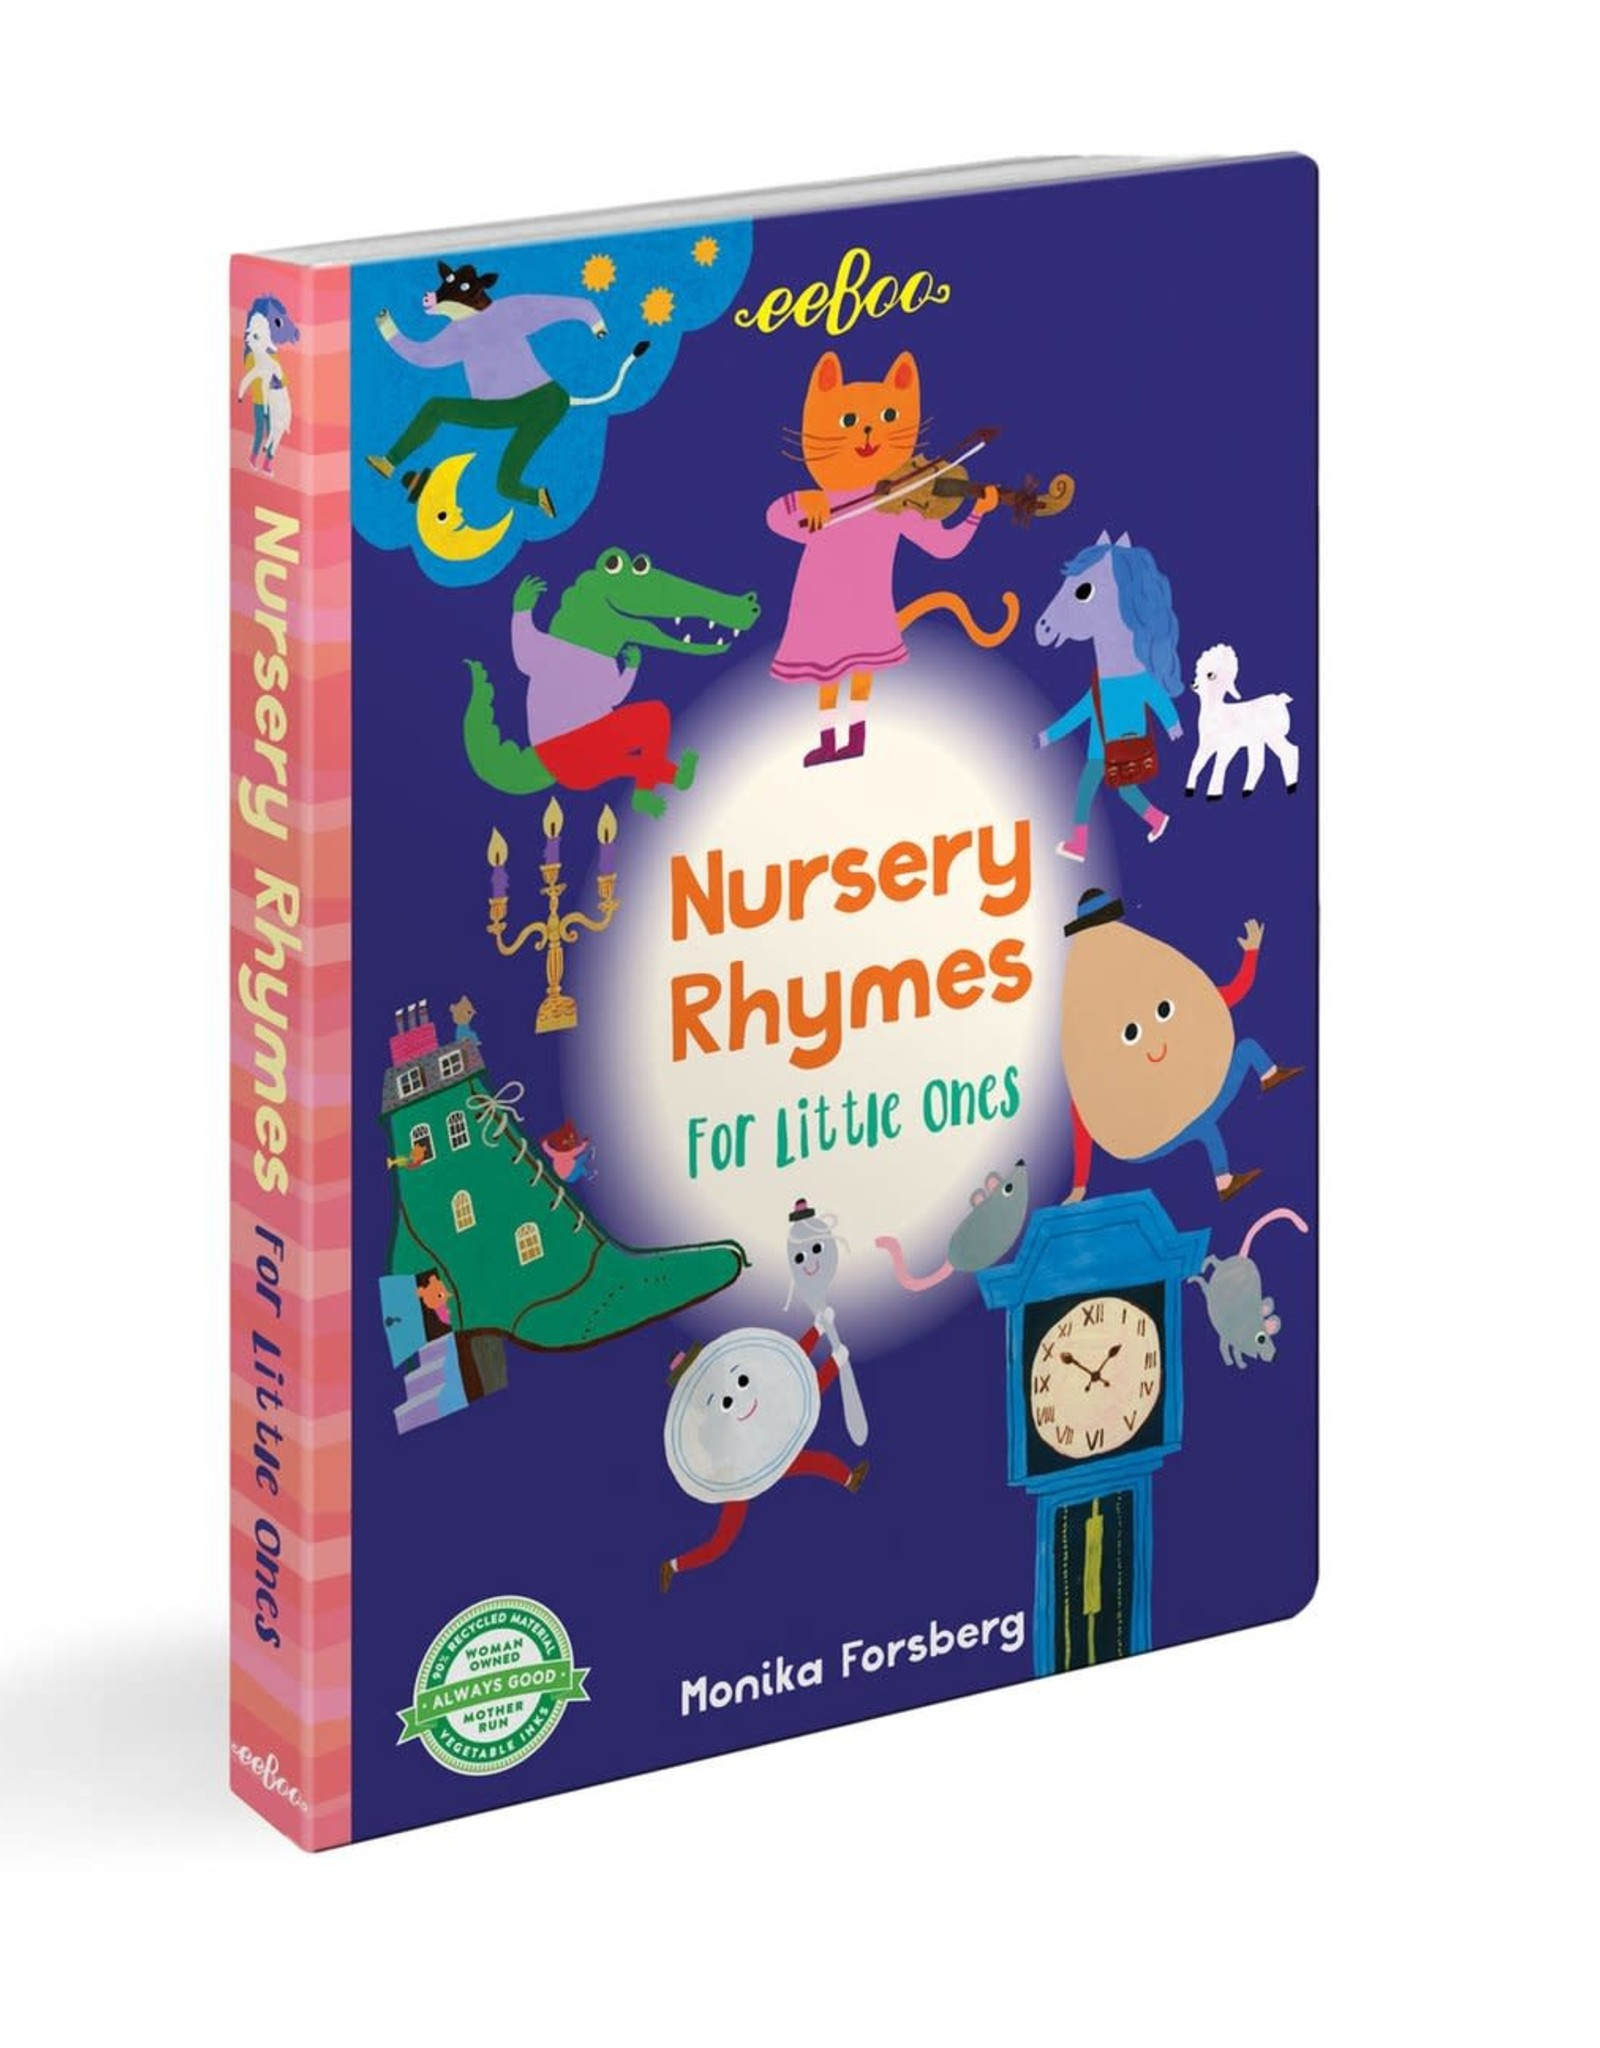 Nursery Rhymes for Little Ones, Illustrated by Monika Forsberg